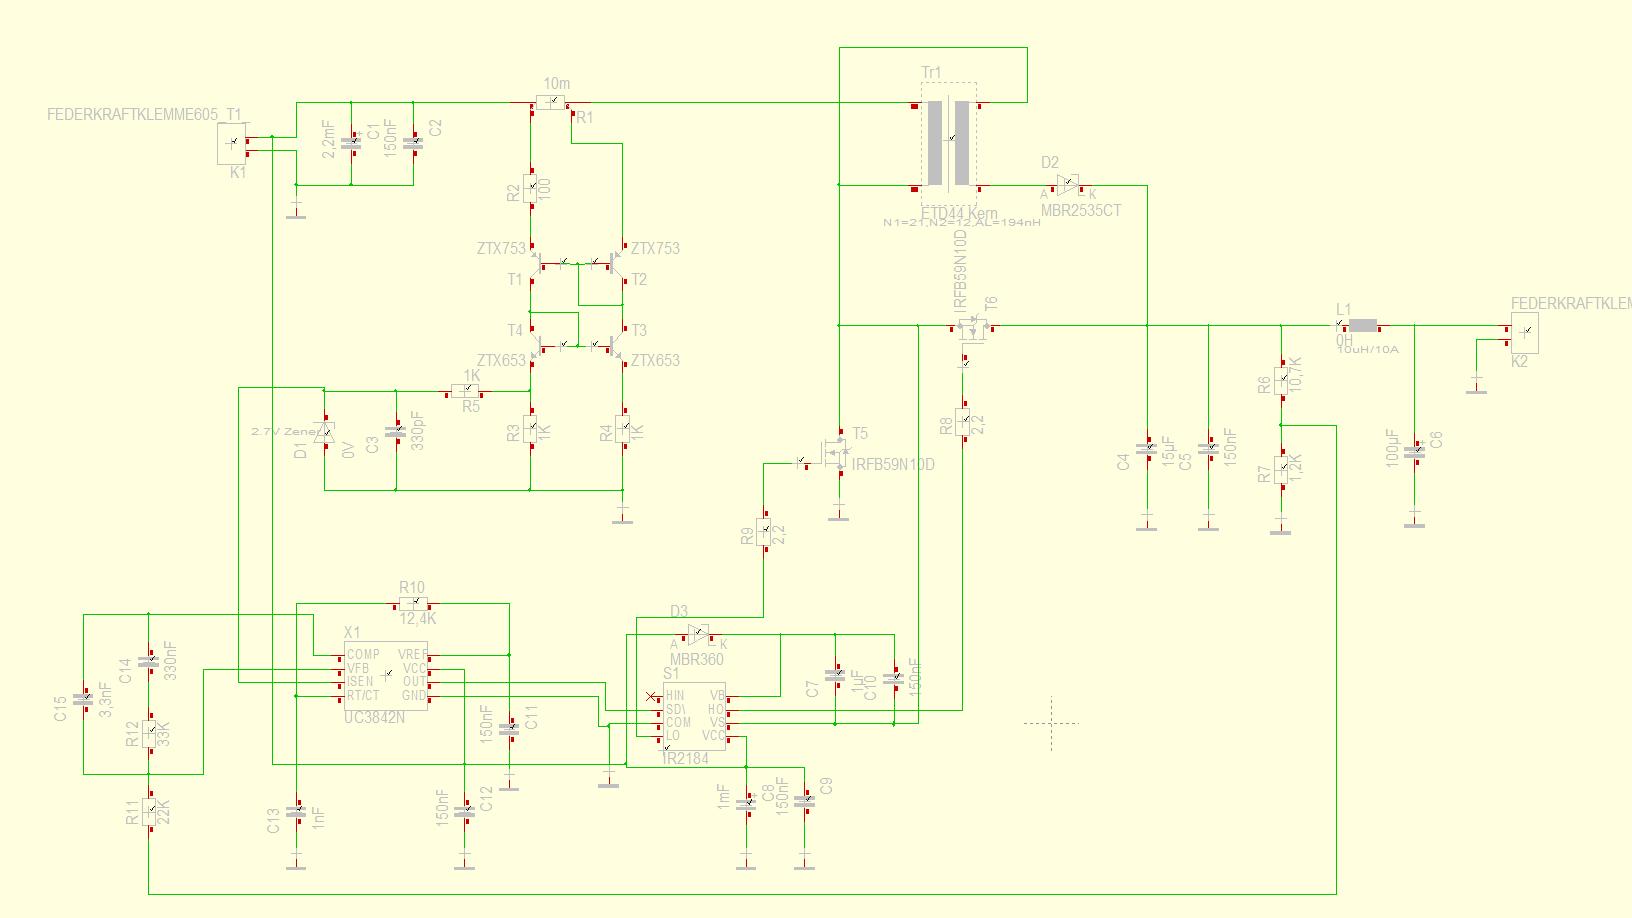 Fein F250 Horn Schaltplan Bilder - Schaltplan Serie Circuit ...